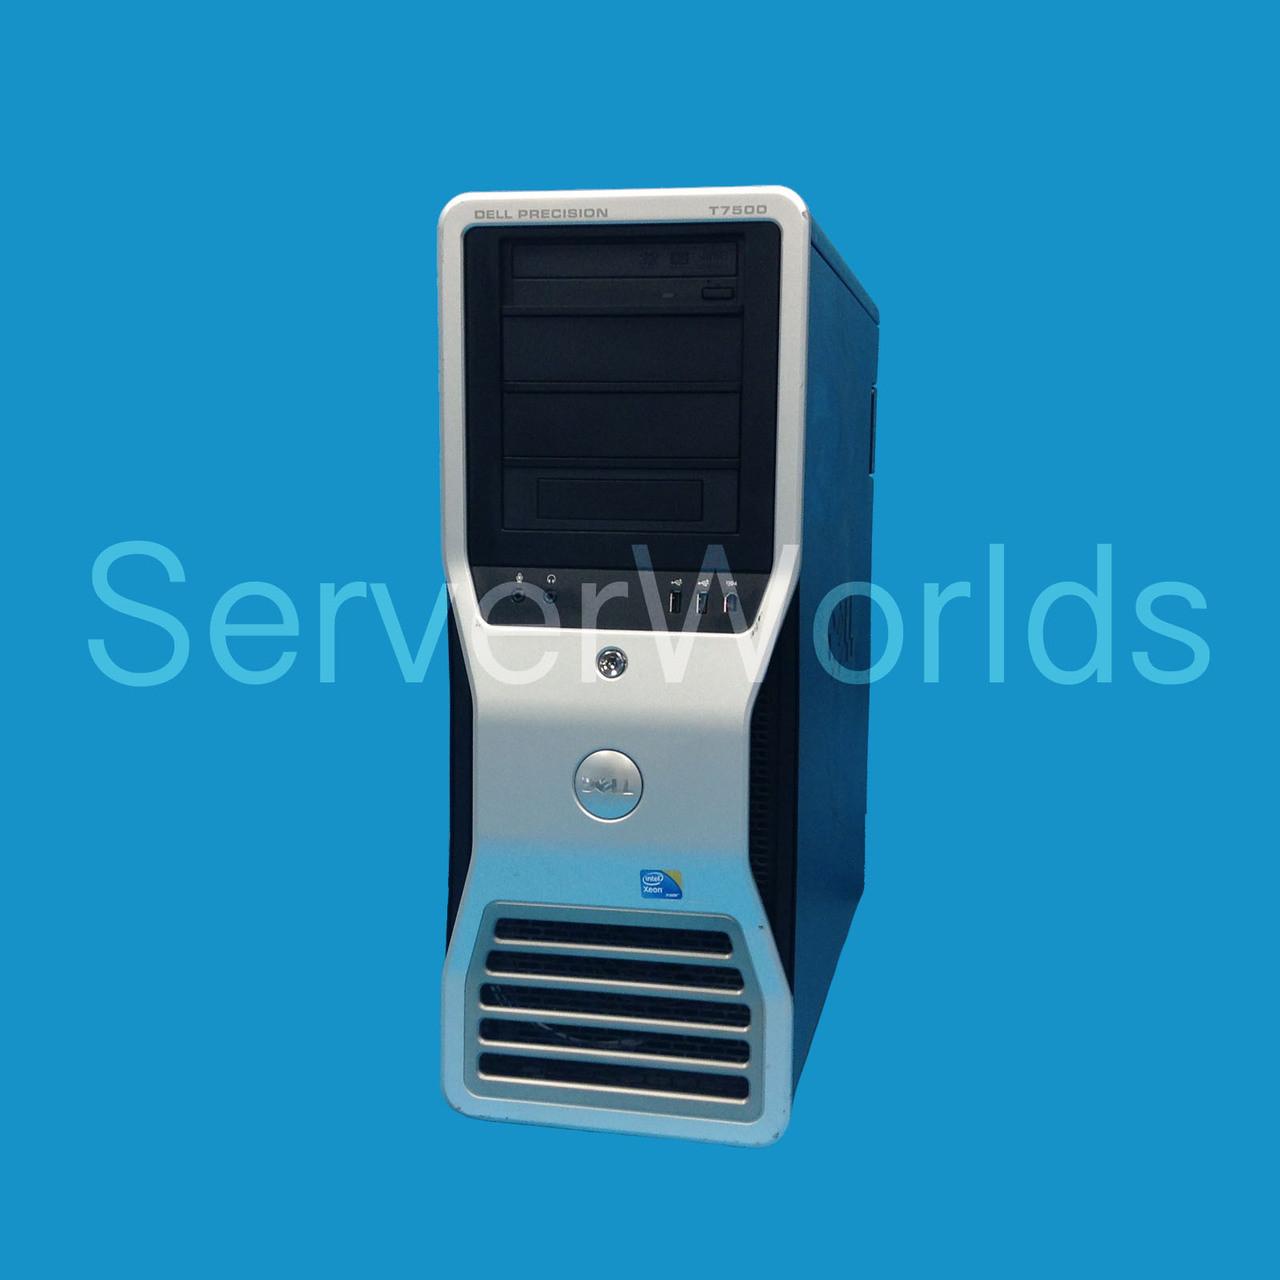 Dell Precision T7500 Broadcom LAN Drivers Windows 7